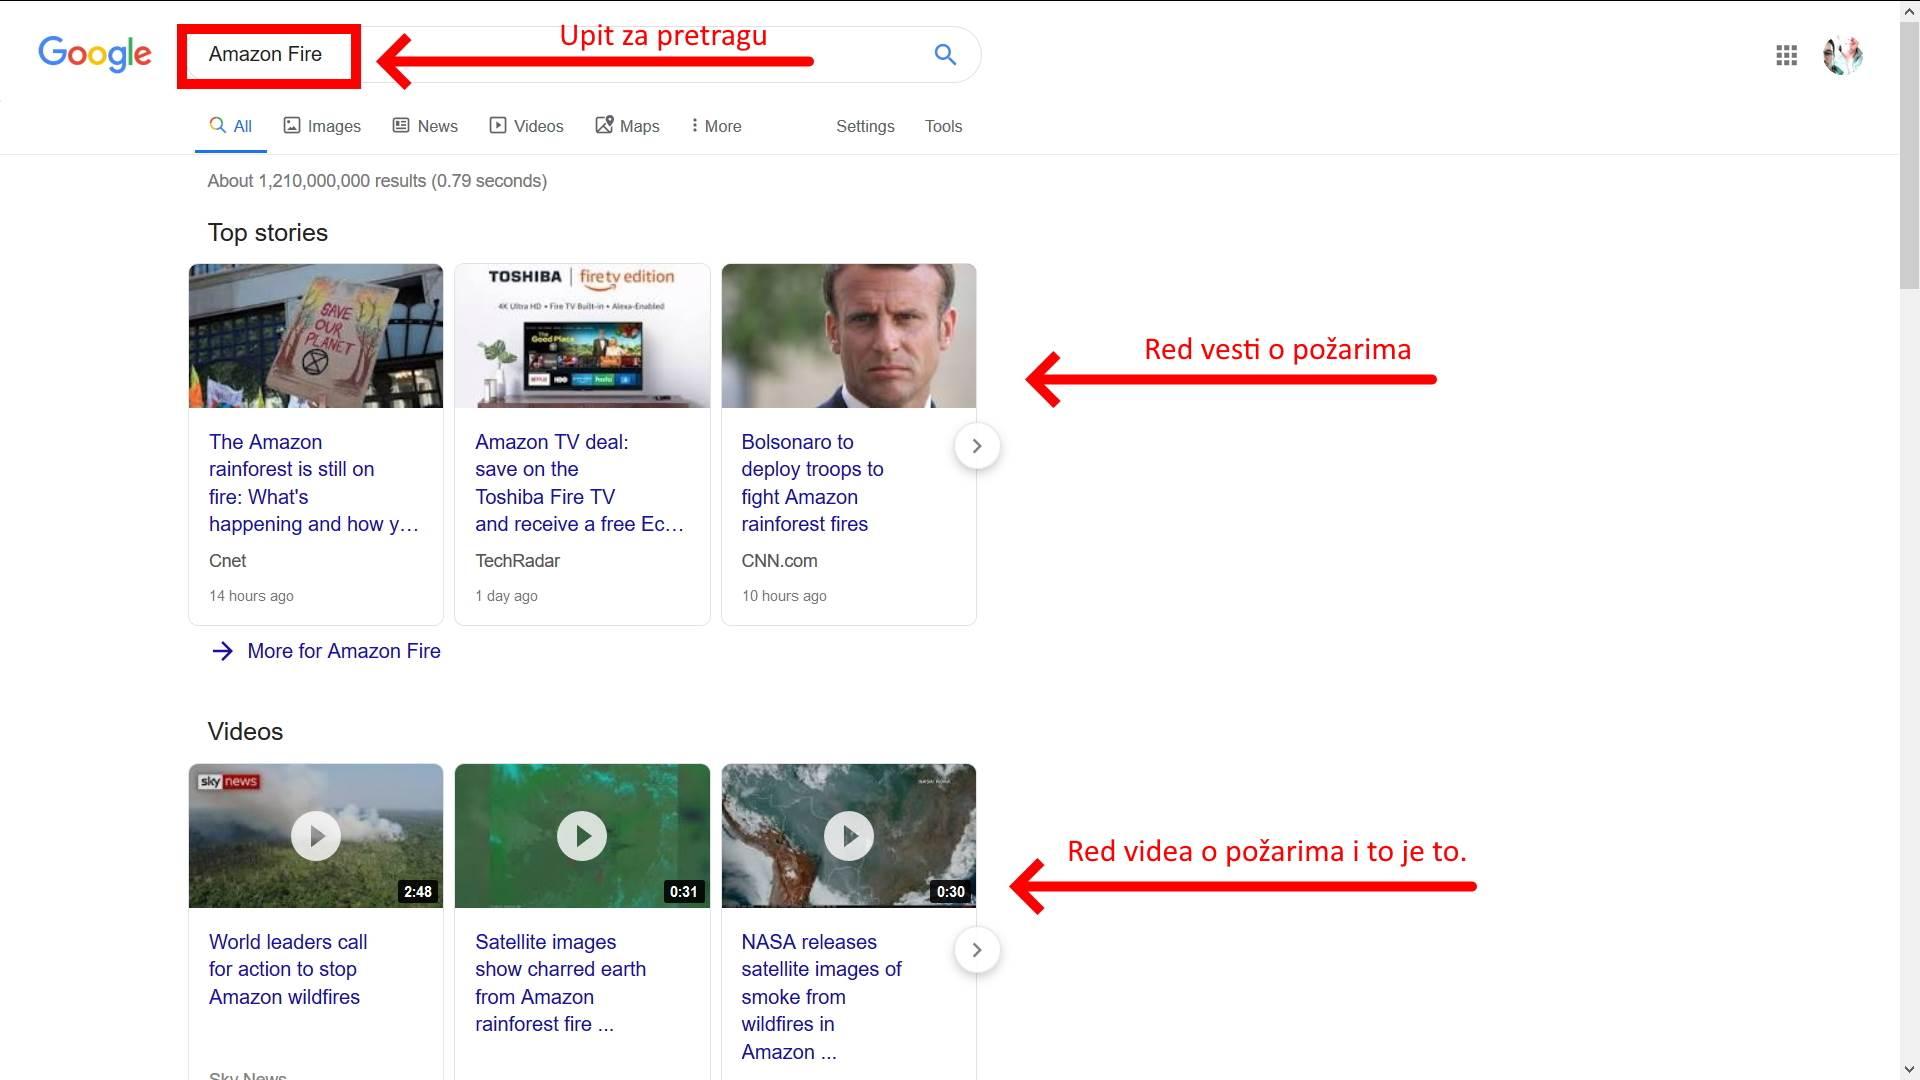 Težak Google propust ili zla namera: Amazon Fire?!